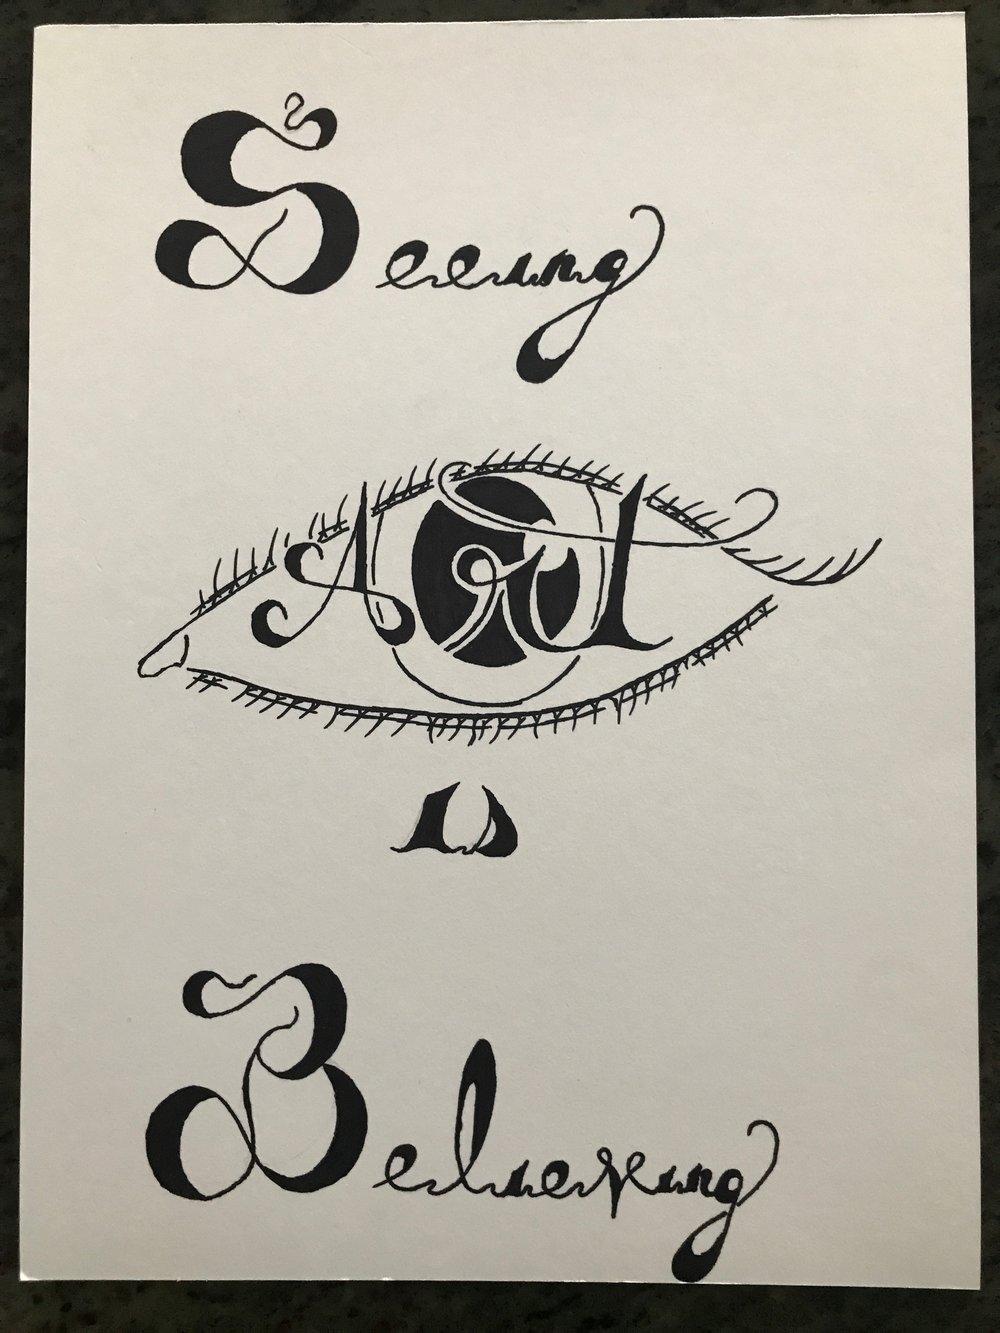 seeingisbelieving_jerome